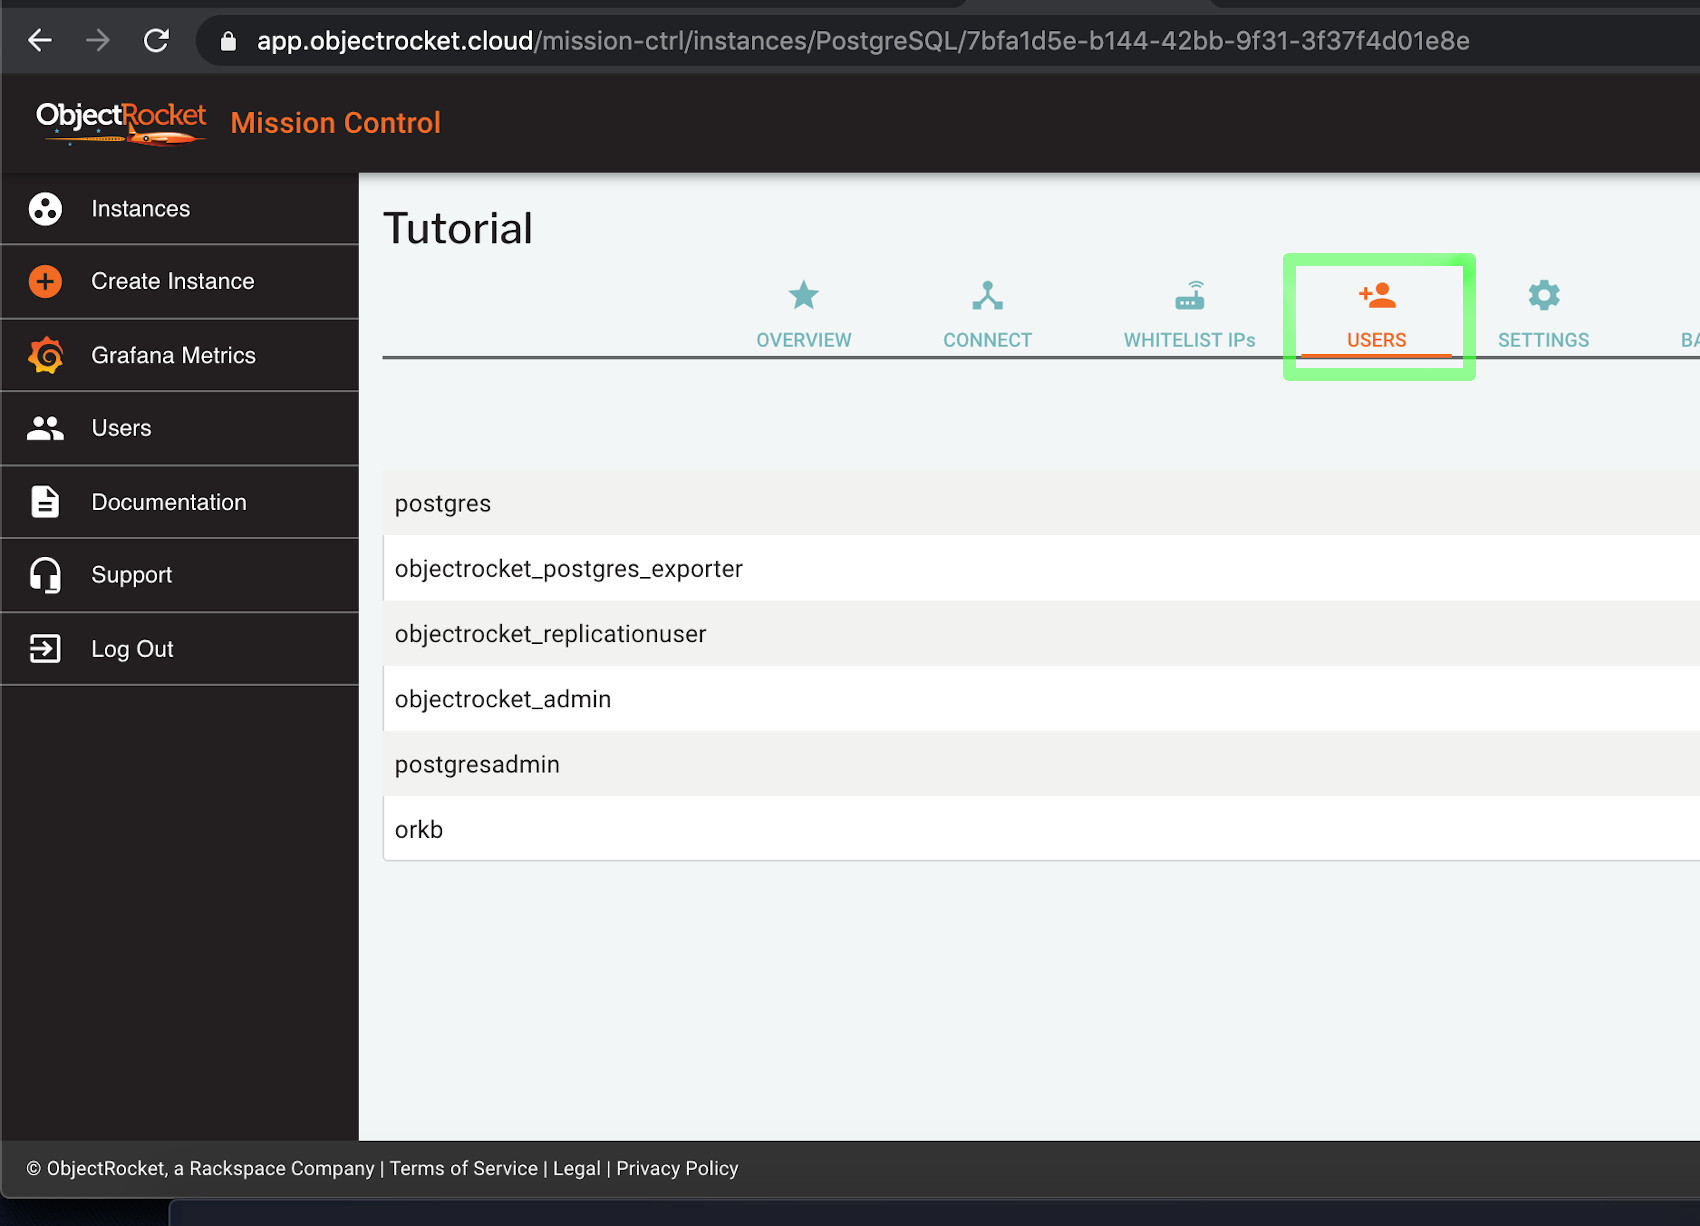 Screenshot of Mission Control for ObjectRocket PostgreSQL create user example